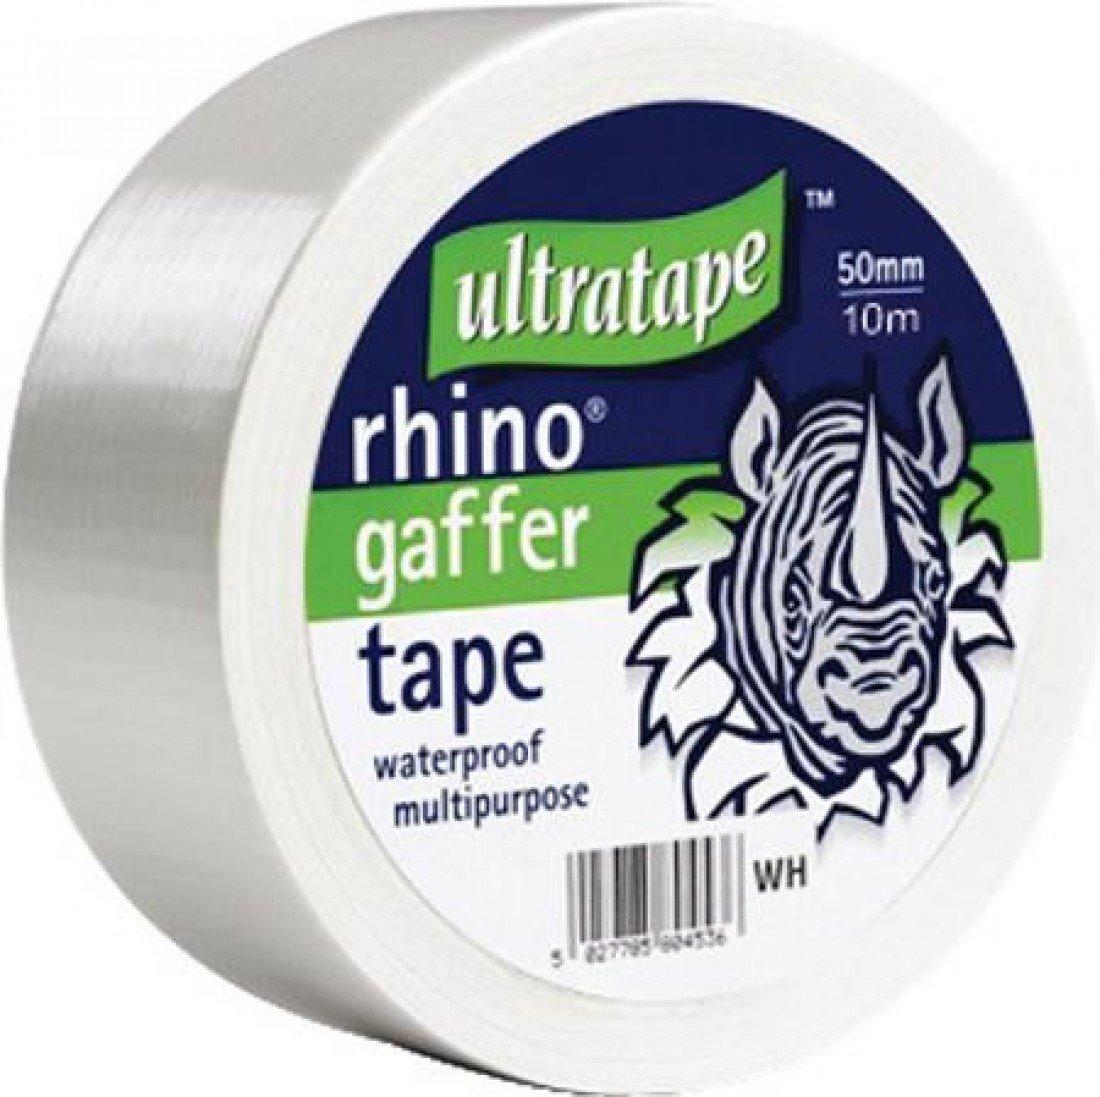 Cloth Gaffer Tape (Wasserdicht) 50mx50mm Weiß 1 Rolle / S Ultratape 00415050WHS1